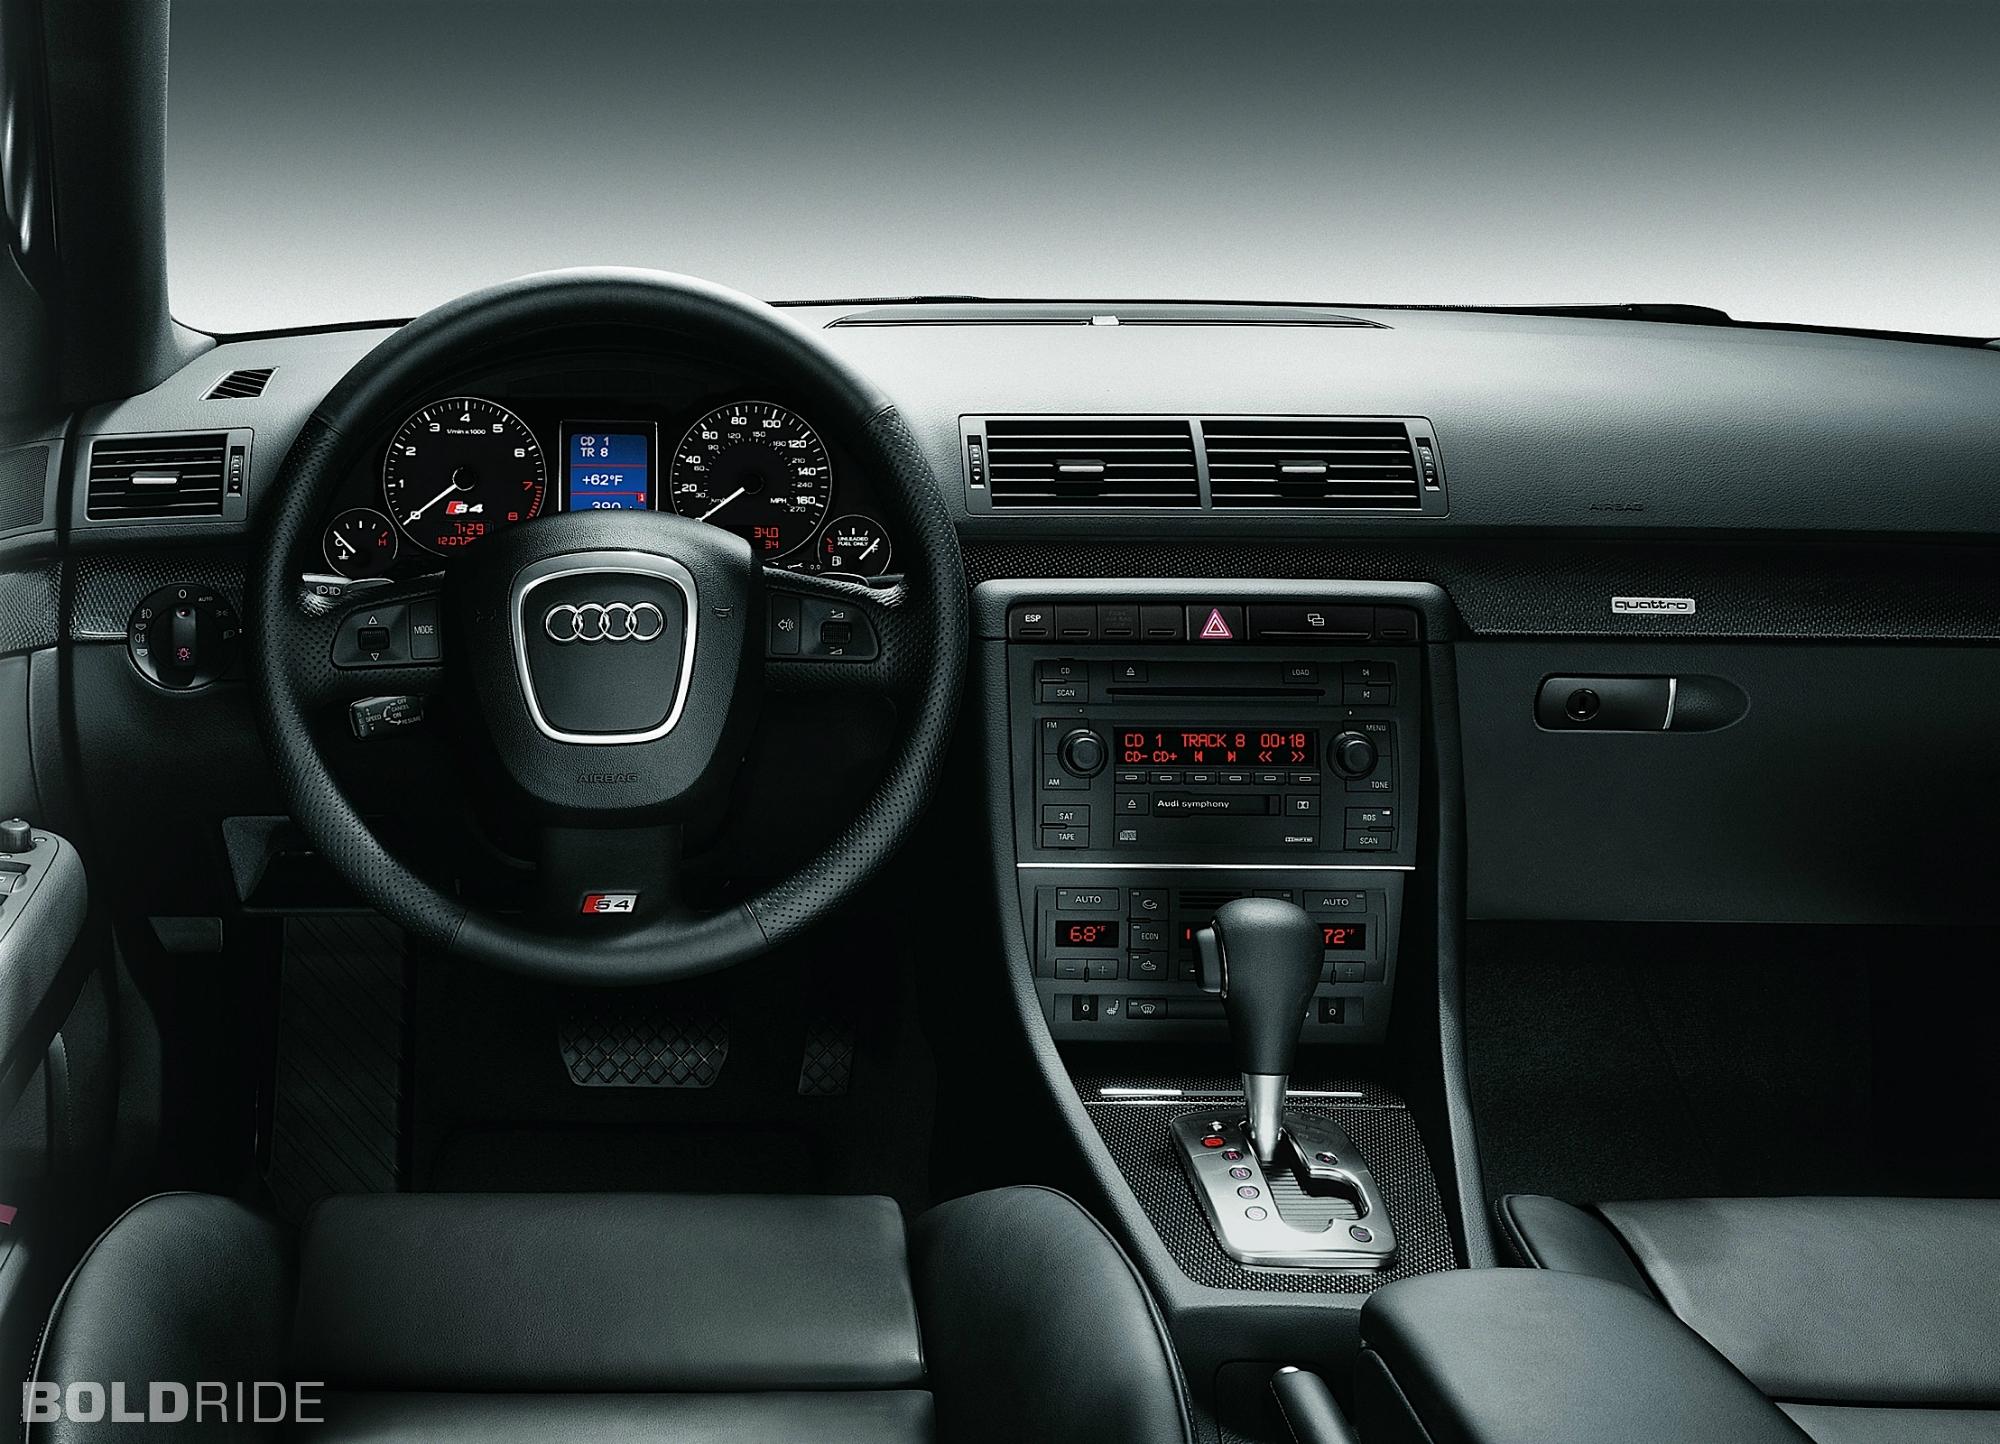 2005 Audi S4 Image 13